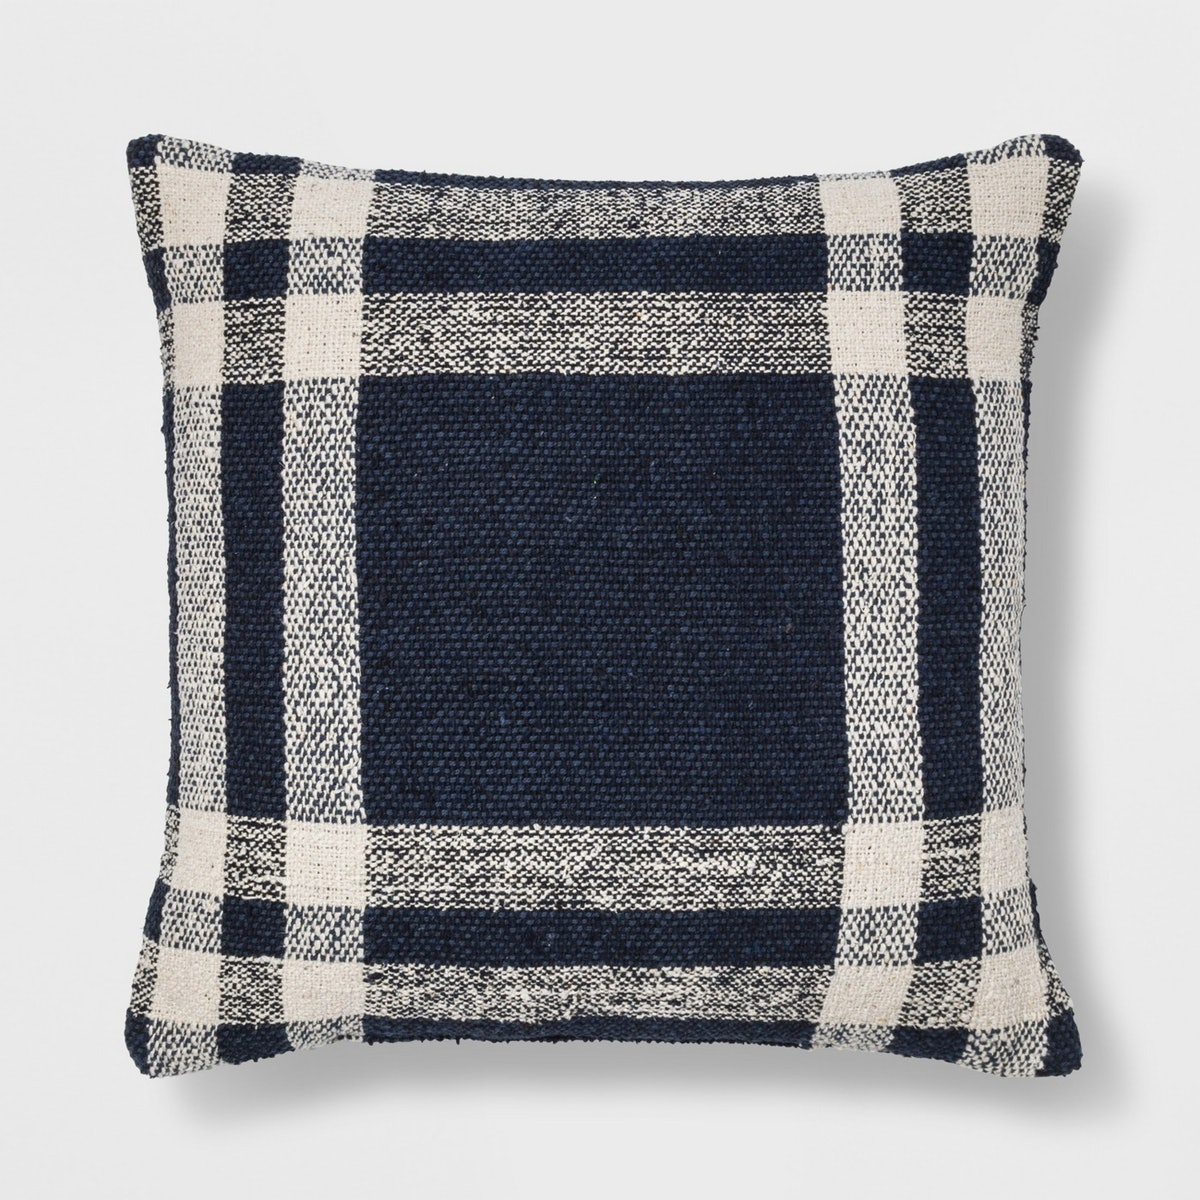 Threshold Woven Plaid Square Throw Pillow Blue